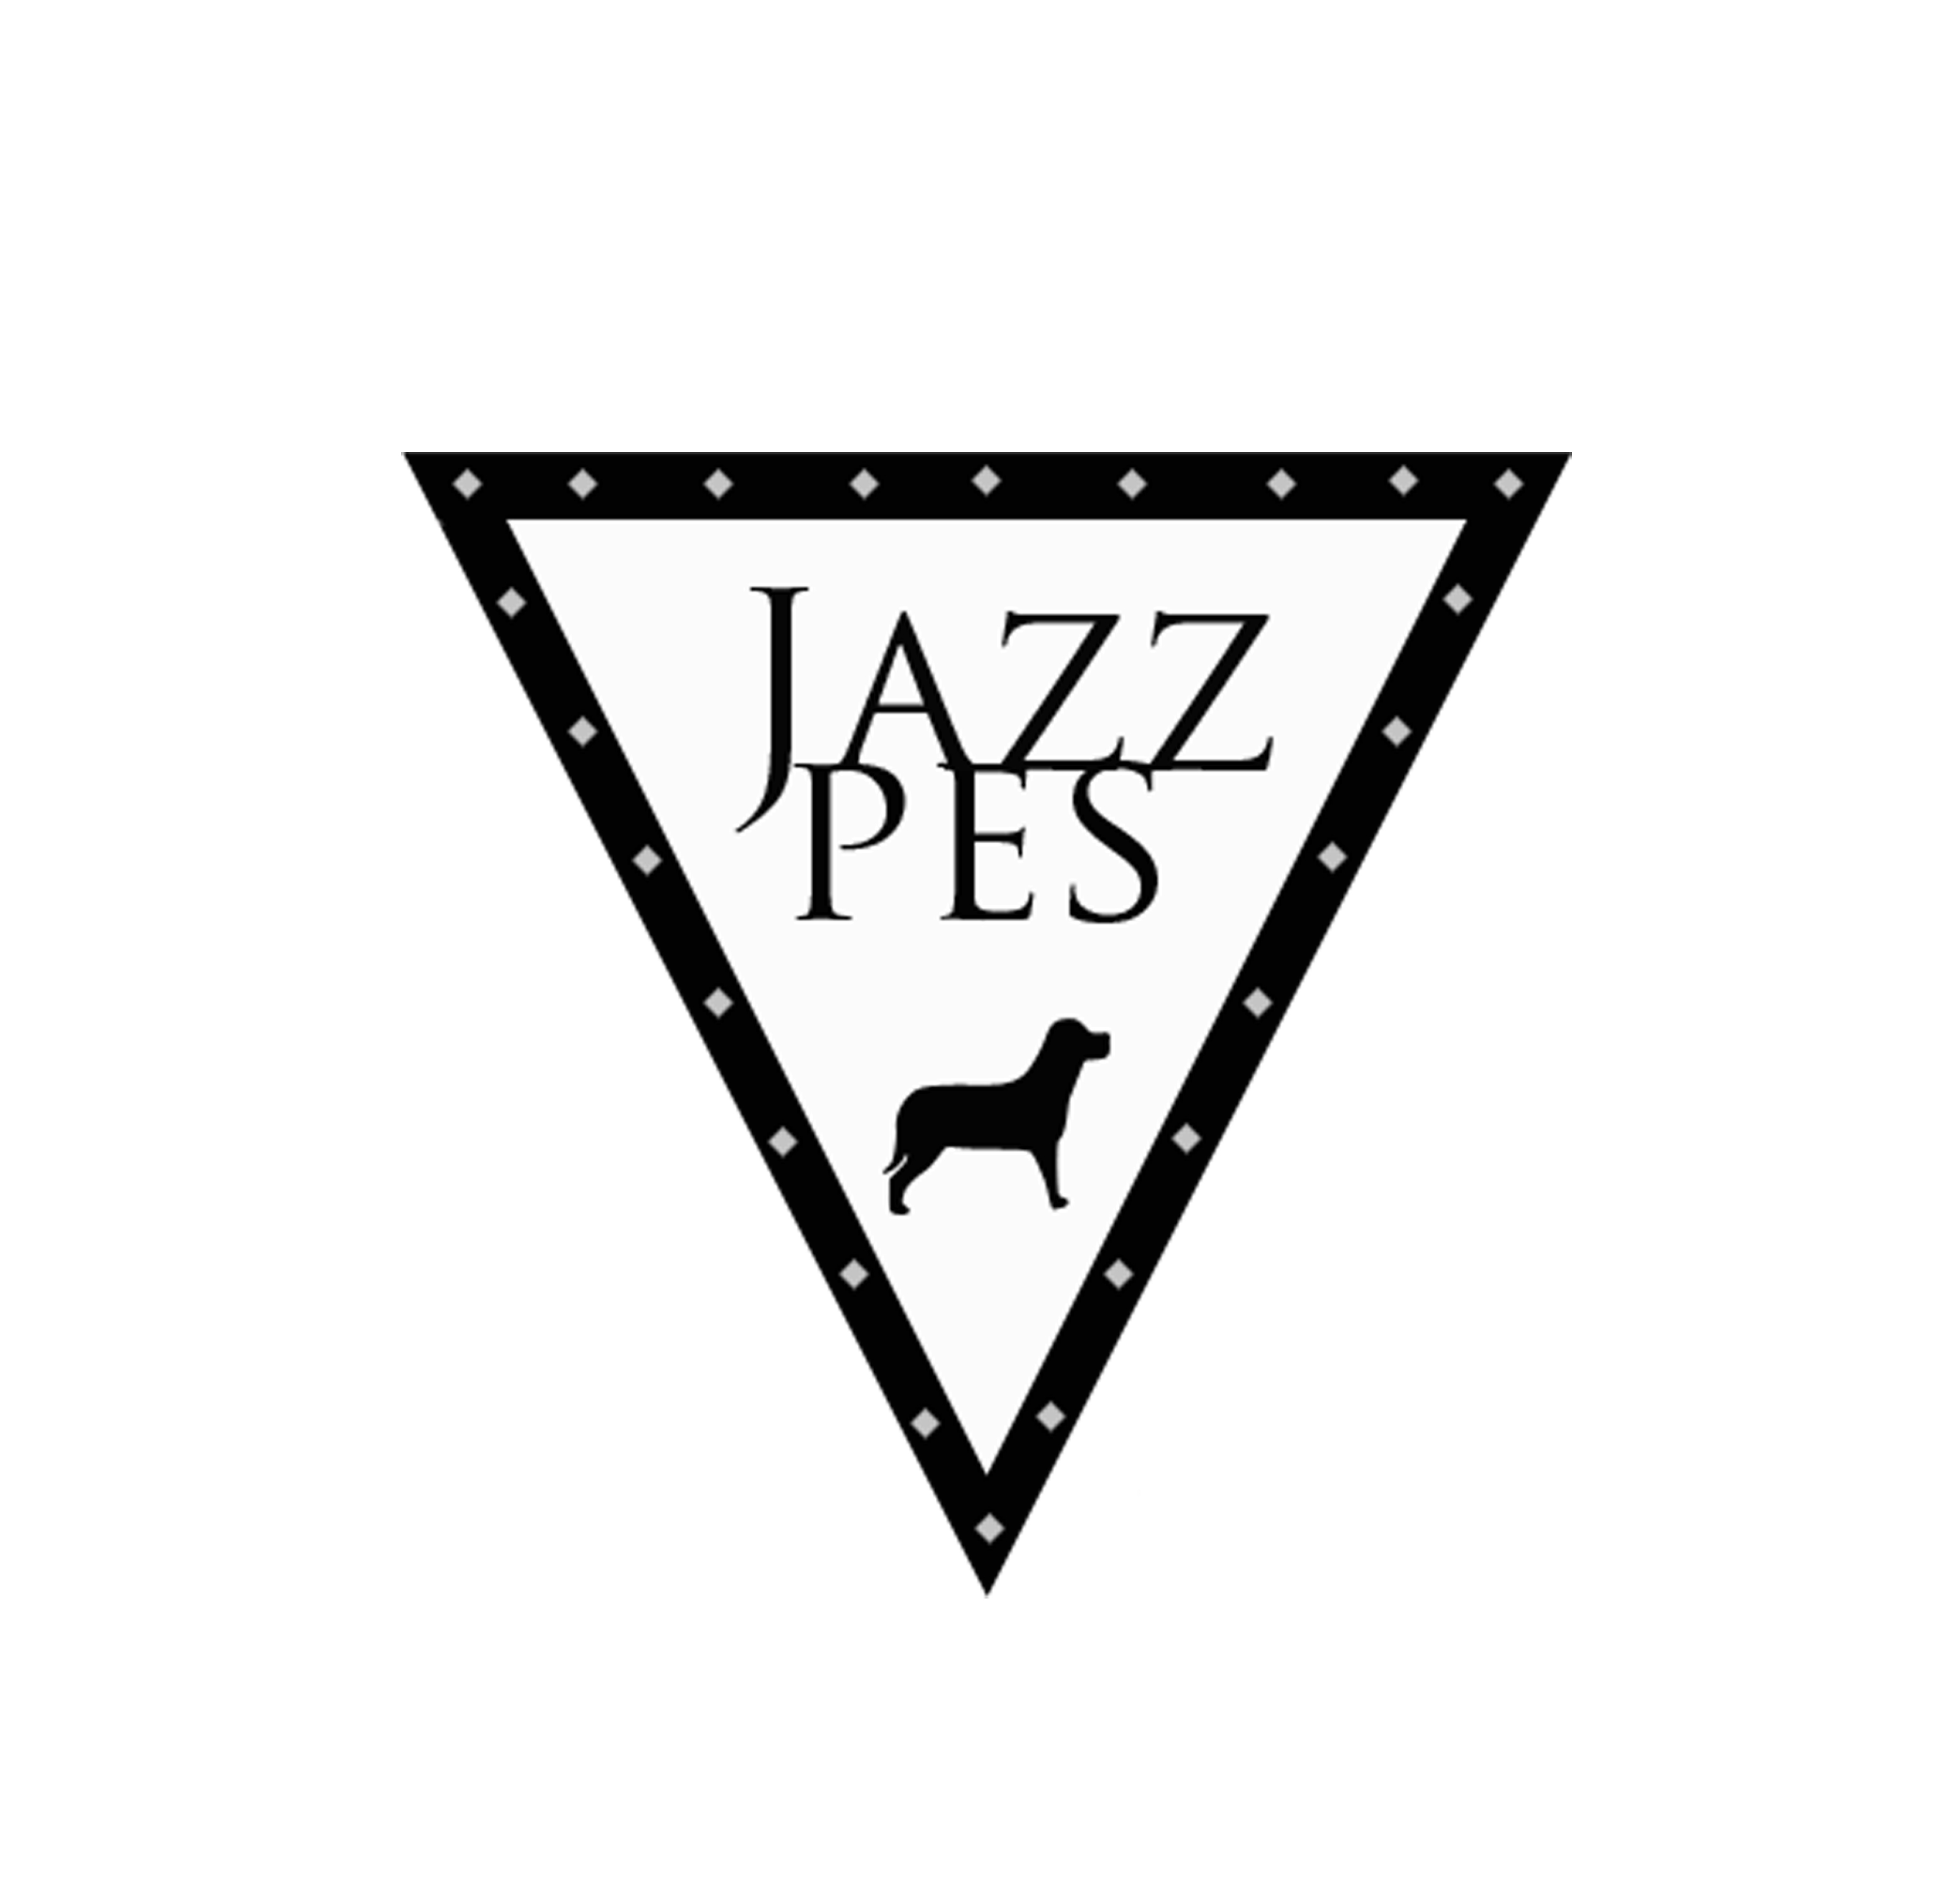 JazzPes